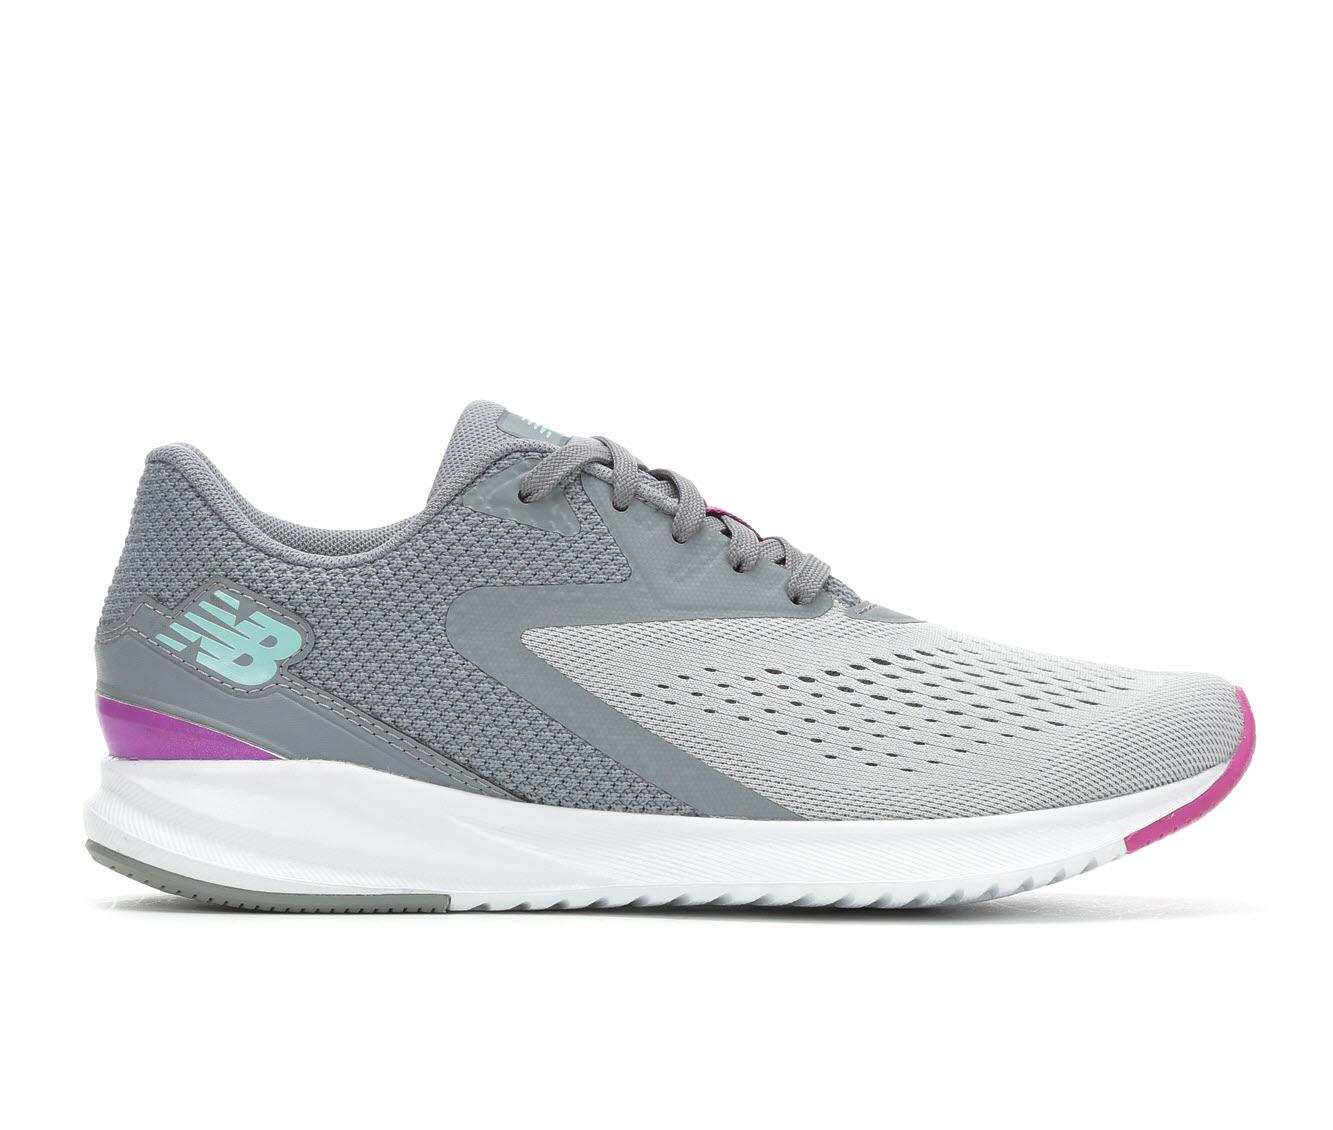 New Balance Vizo Pro Run Women's Athletic Shoe (Gray)